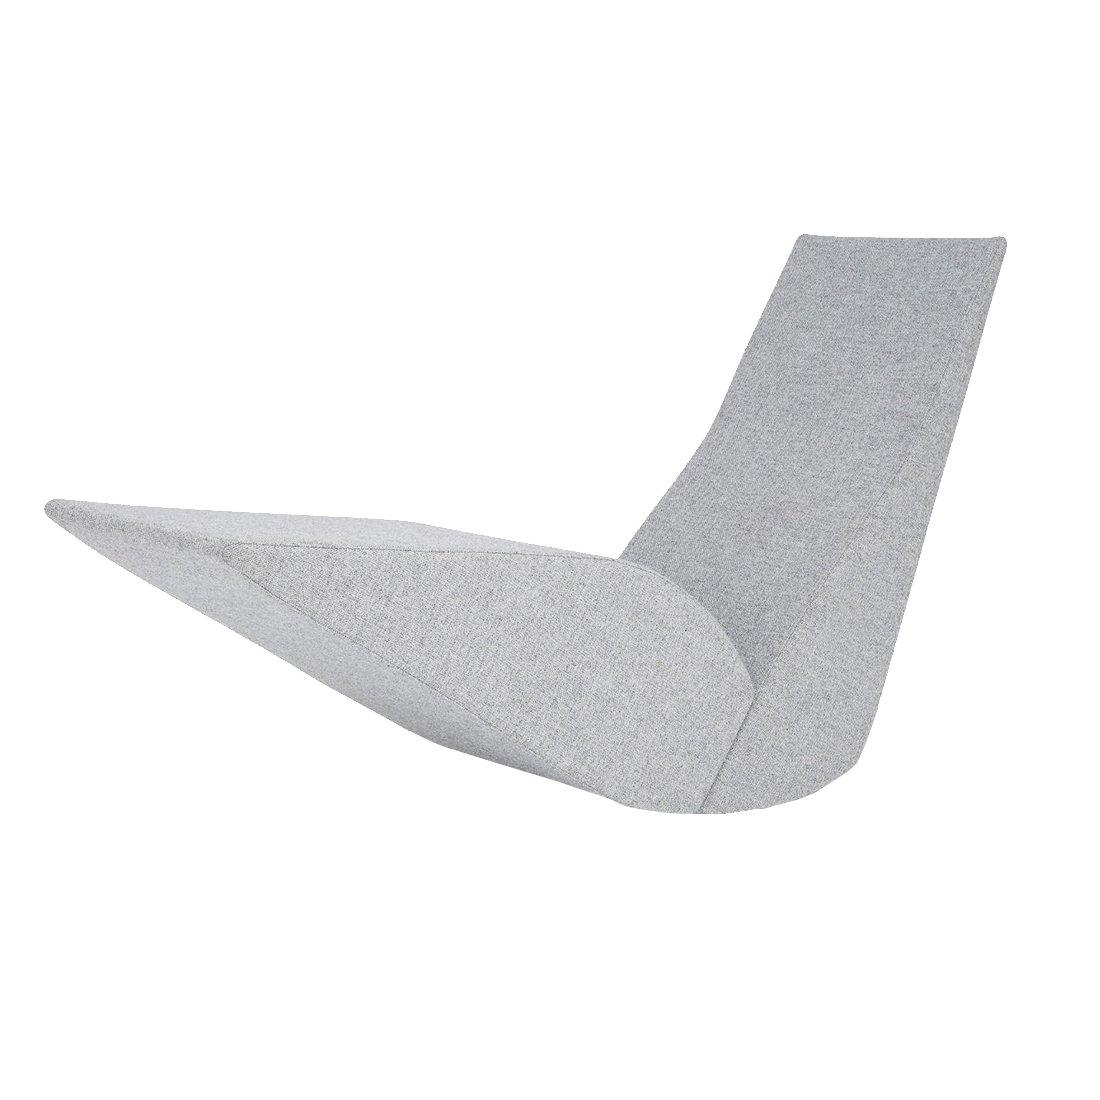 Tom Dixon Bird Chaise Loungestoel